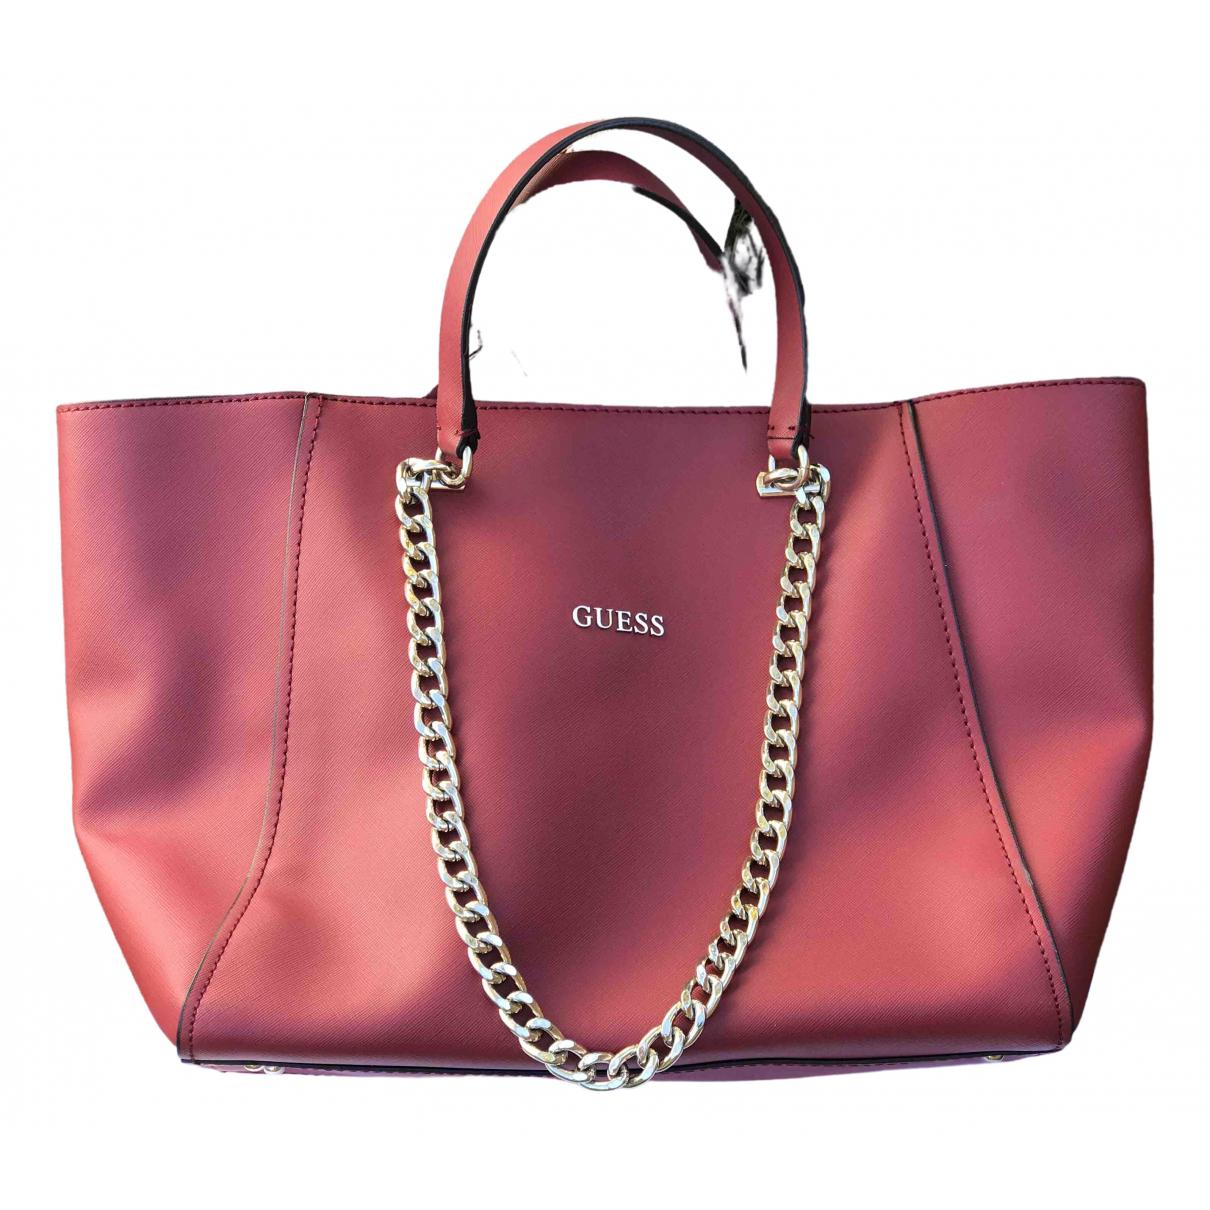 Guess \N Red handbag for Women \N